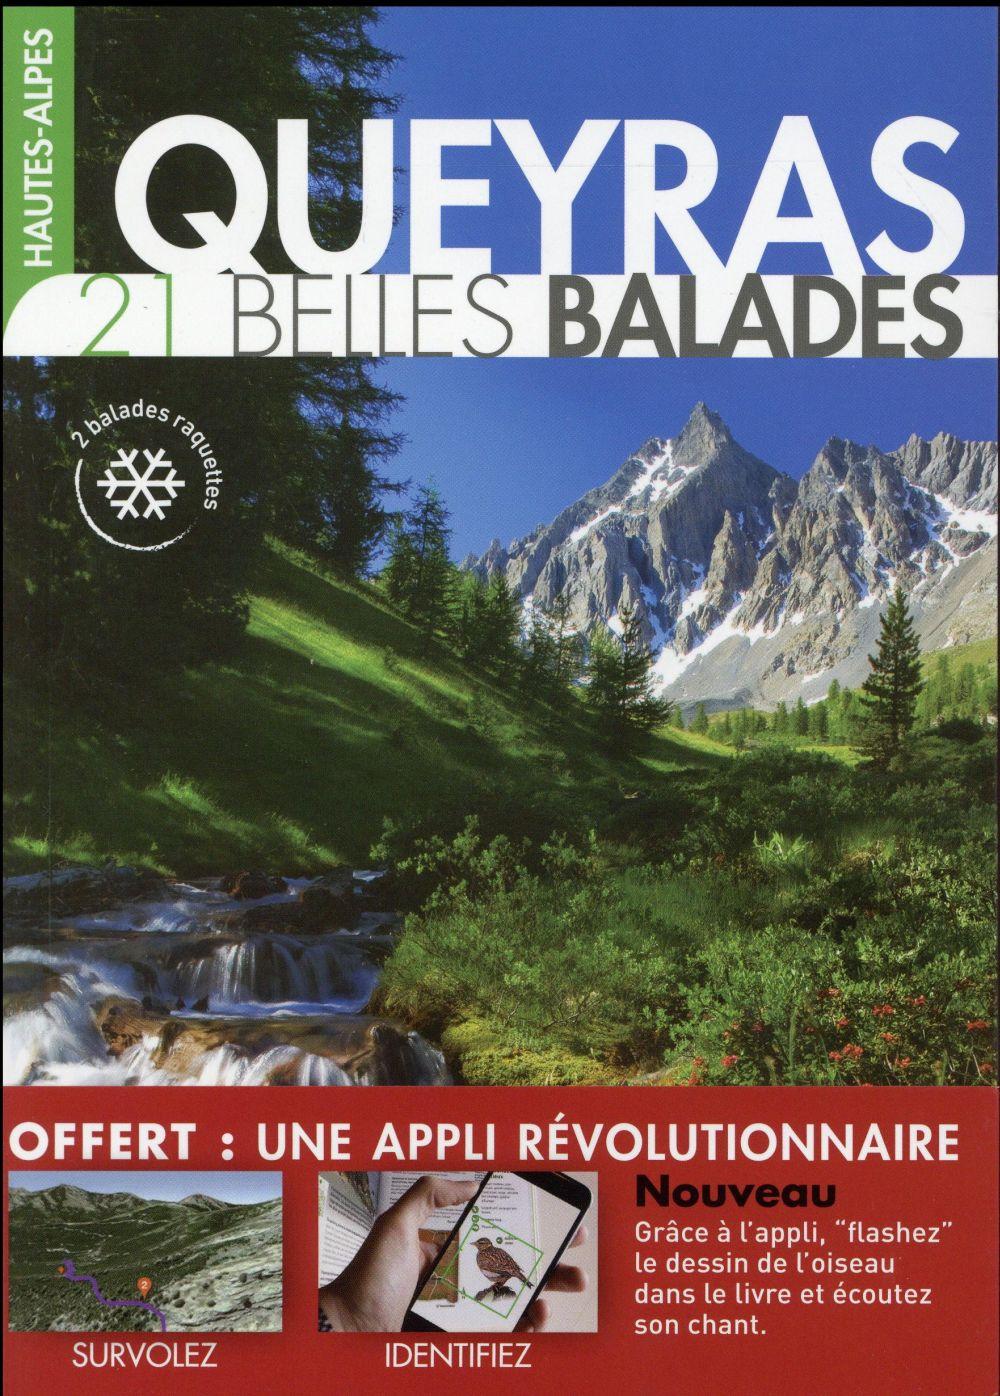 Hautes-Alpes ; Queyras ; 21 belles balades